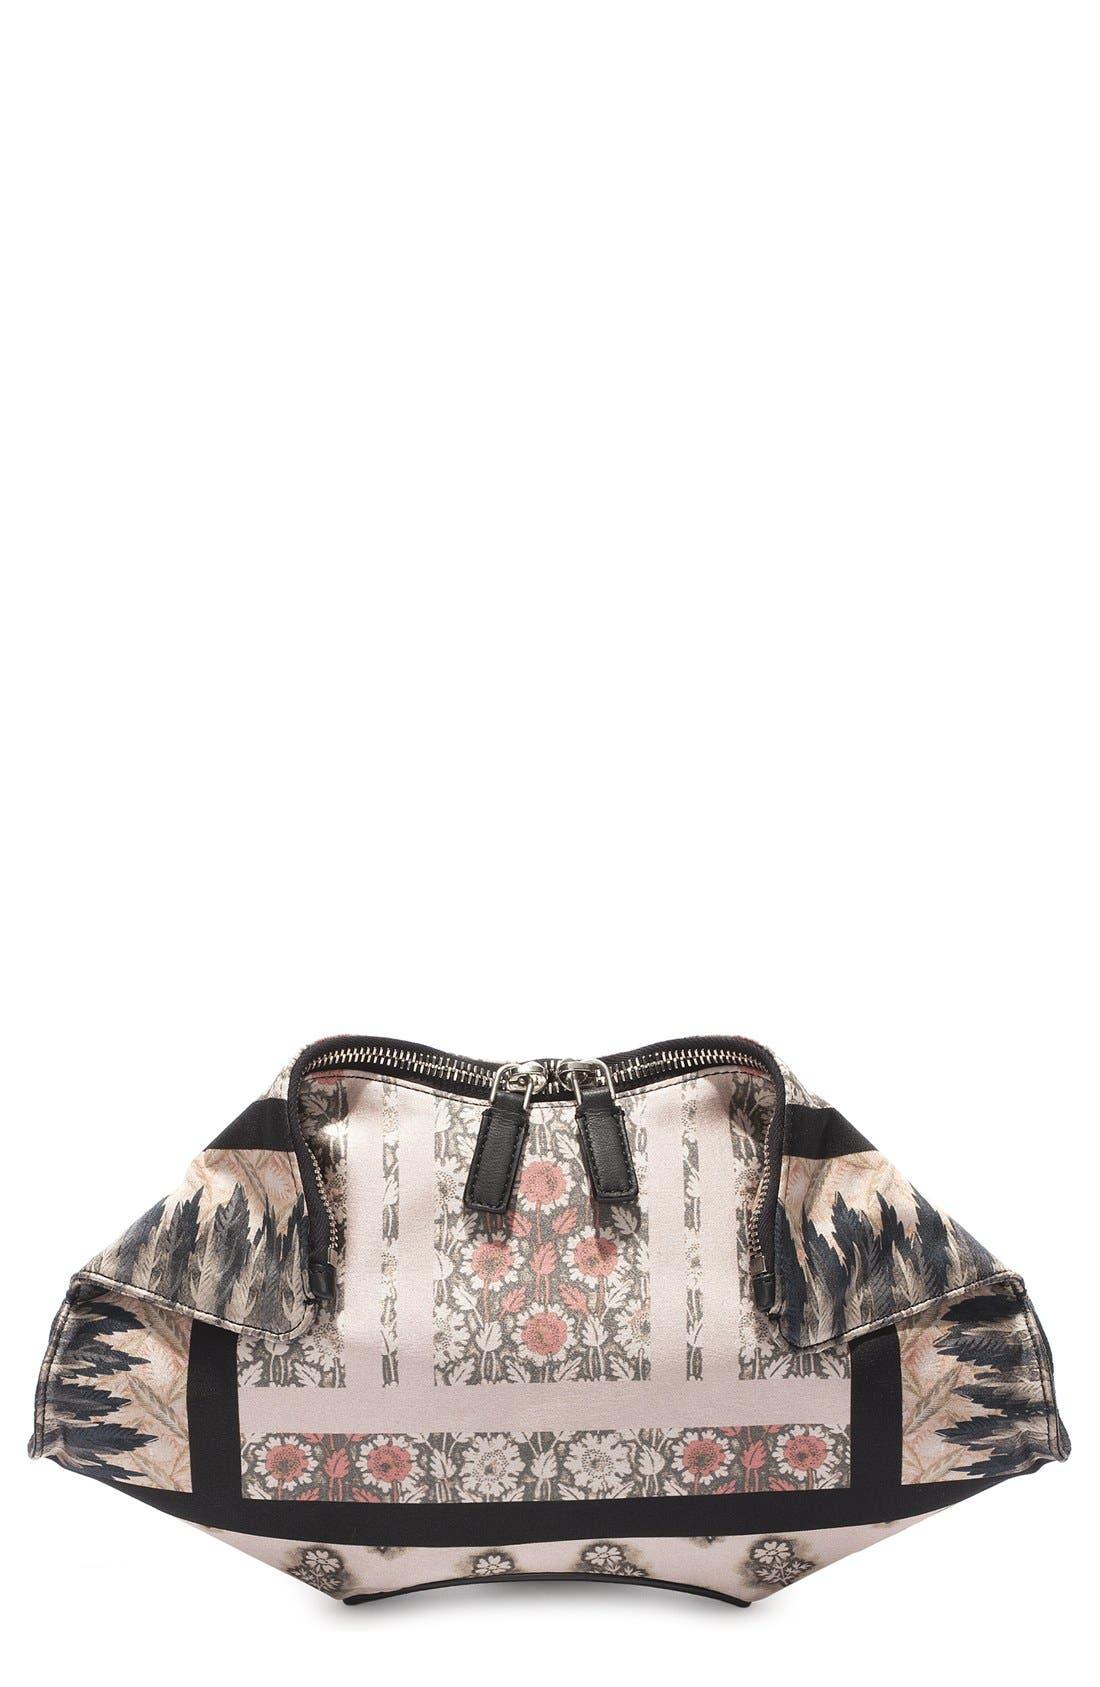 Main Image - Alexander McQueen 'Small De Manta' Floral Print Silk Clutch